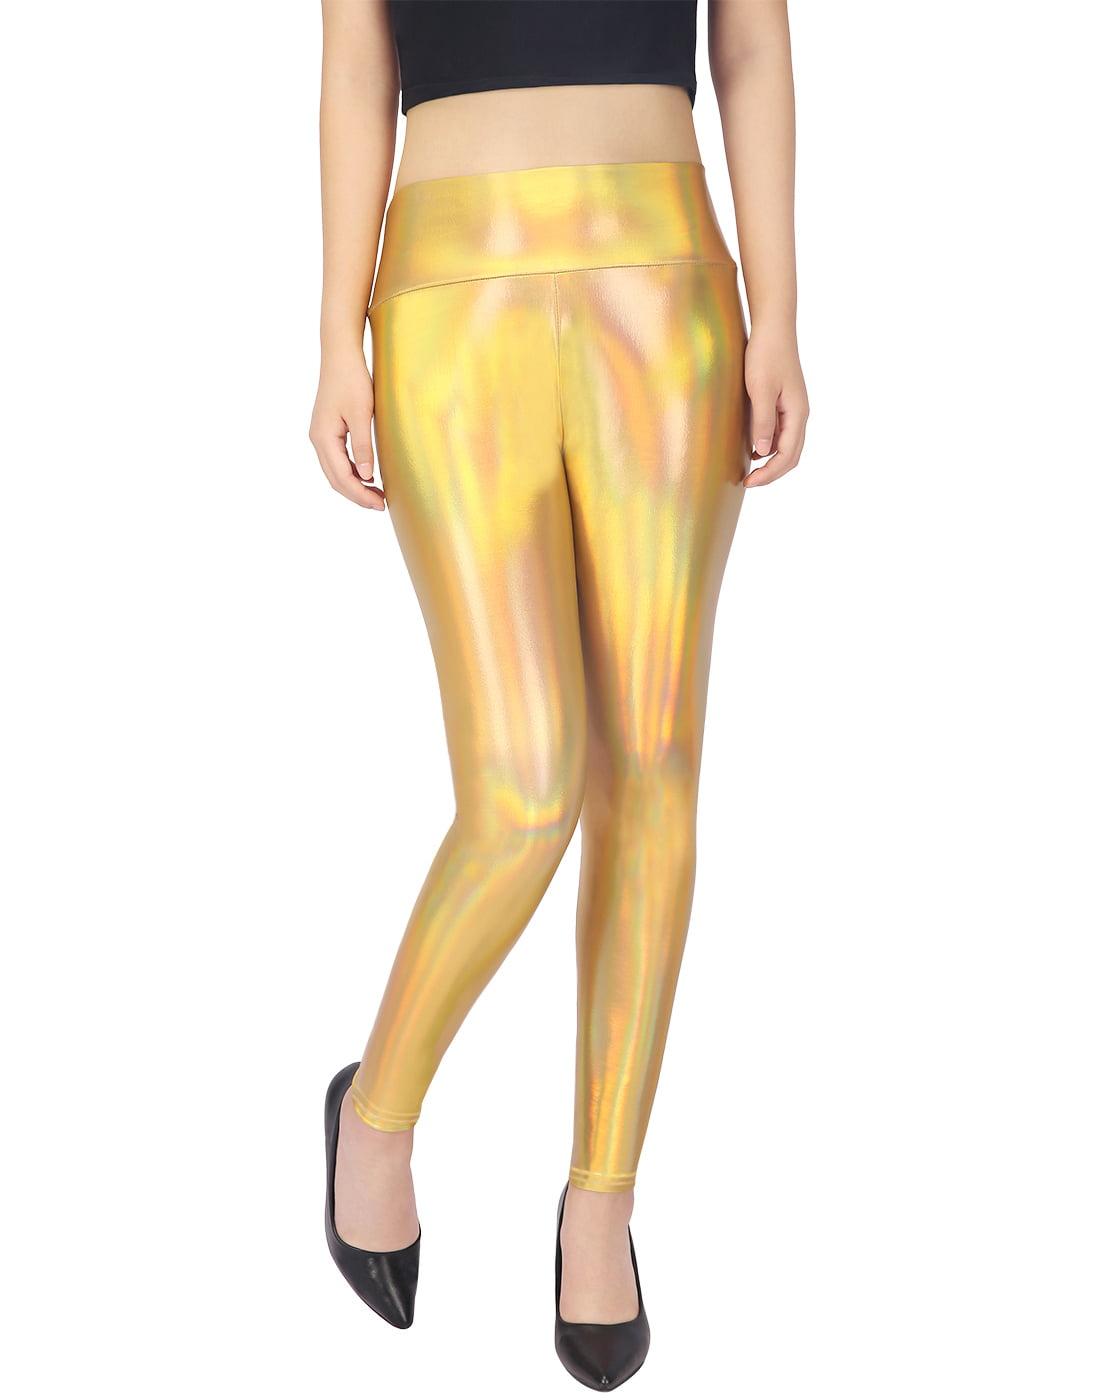 f8f44a2906d36 Hde womens shiny holographic leggings liquid metallic pants iridescent tights  gold large jpeg 450x450 Shiny gold